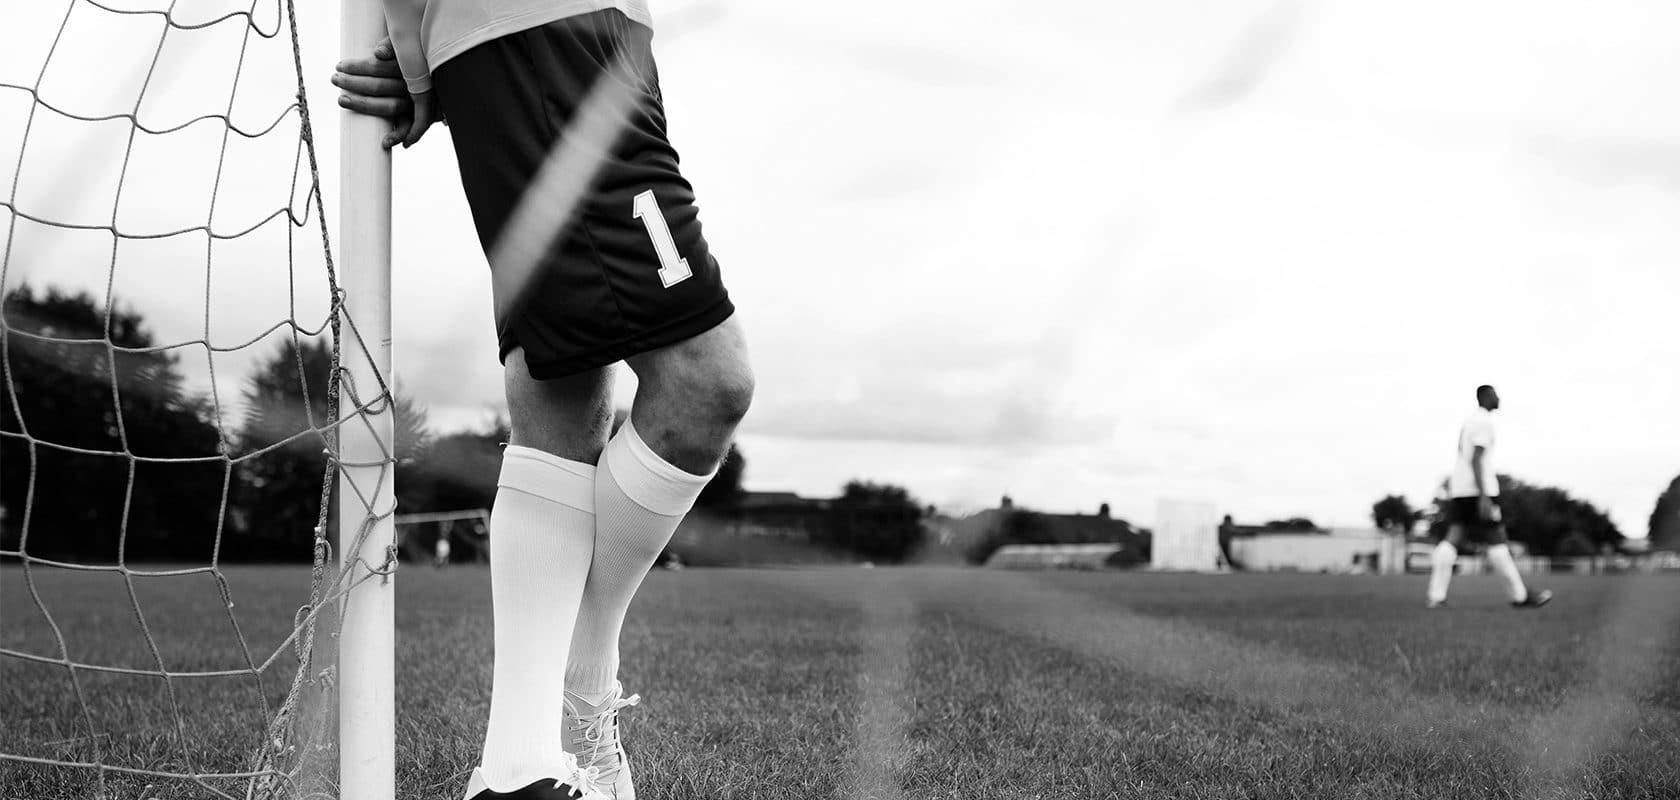 Soccer Player Standing Goal